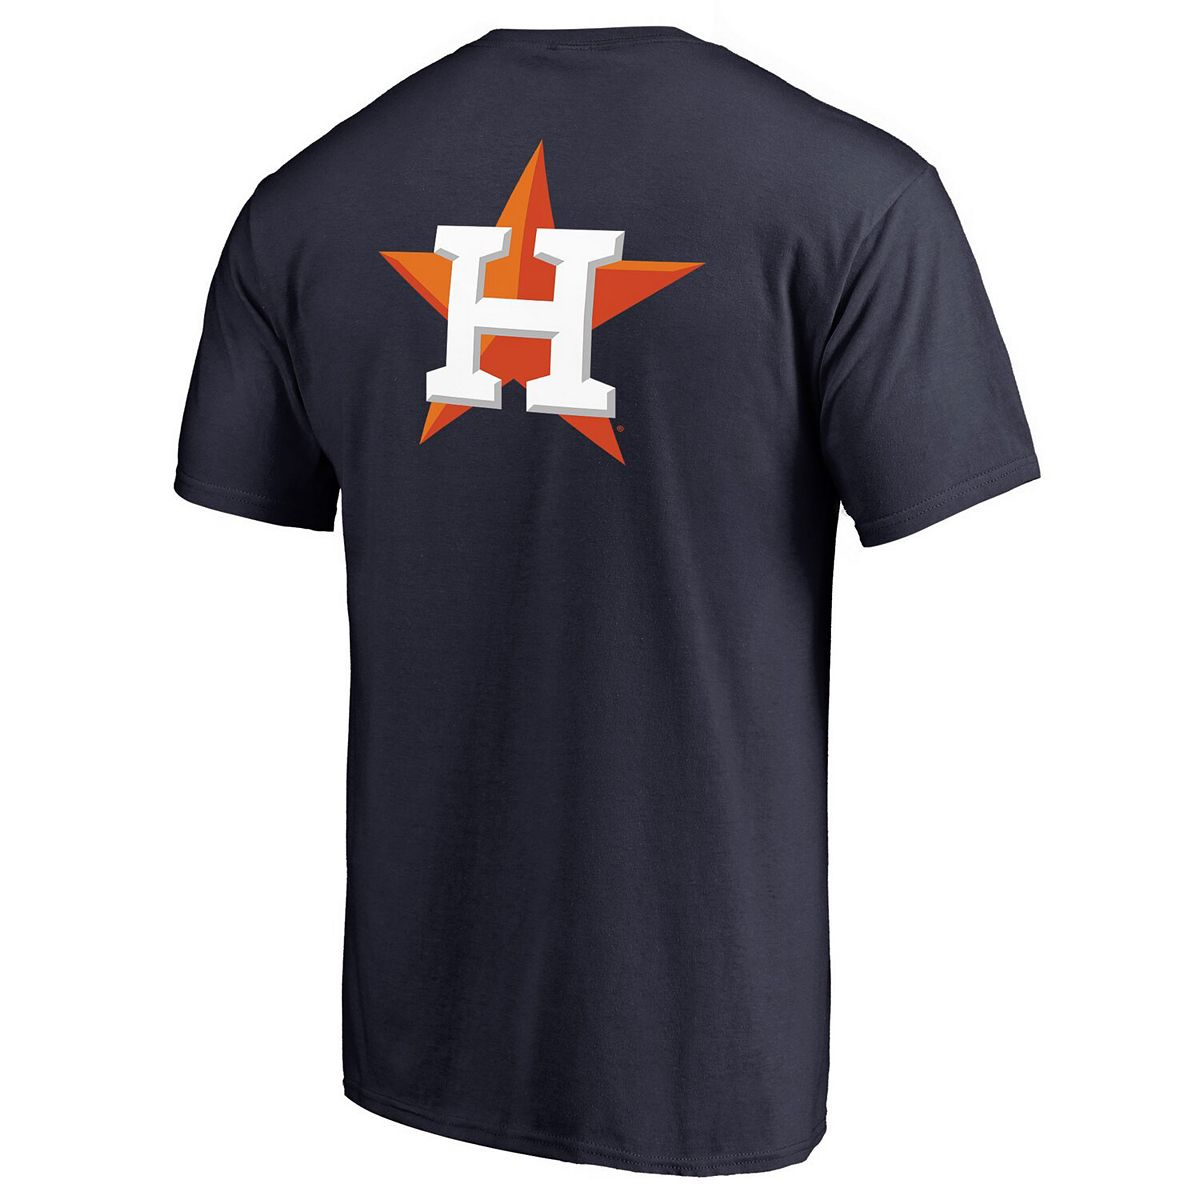 Men's Fanatics Branded Navy Houston Astros End Game T-Shirt RjLuV